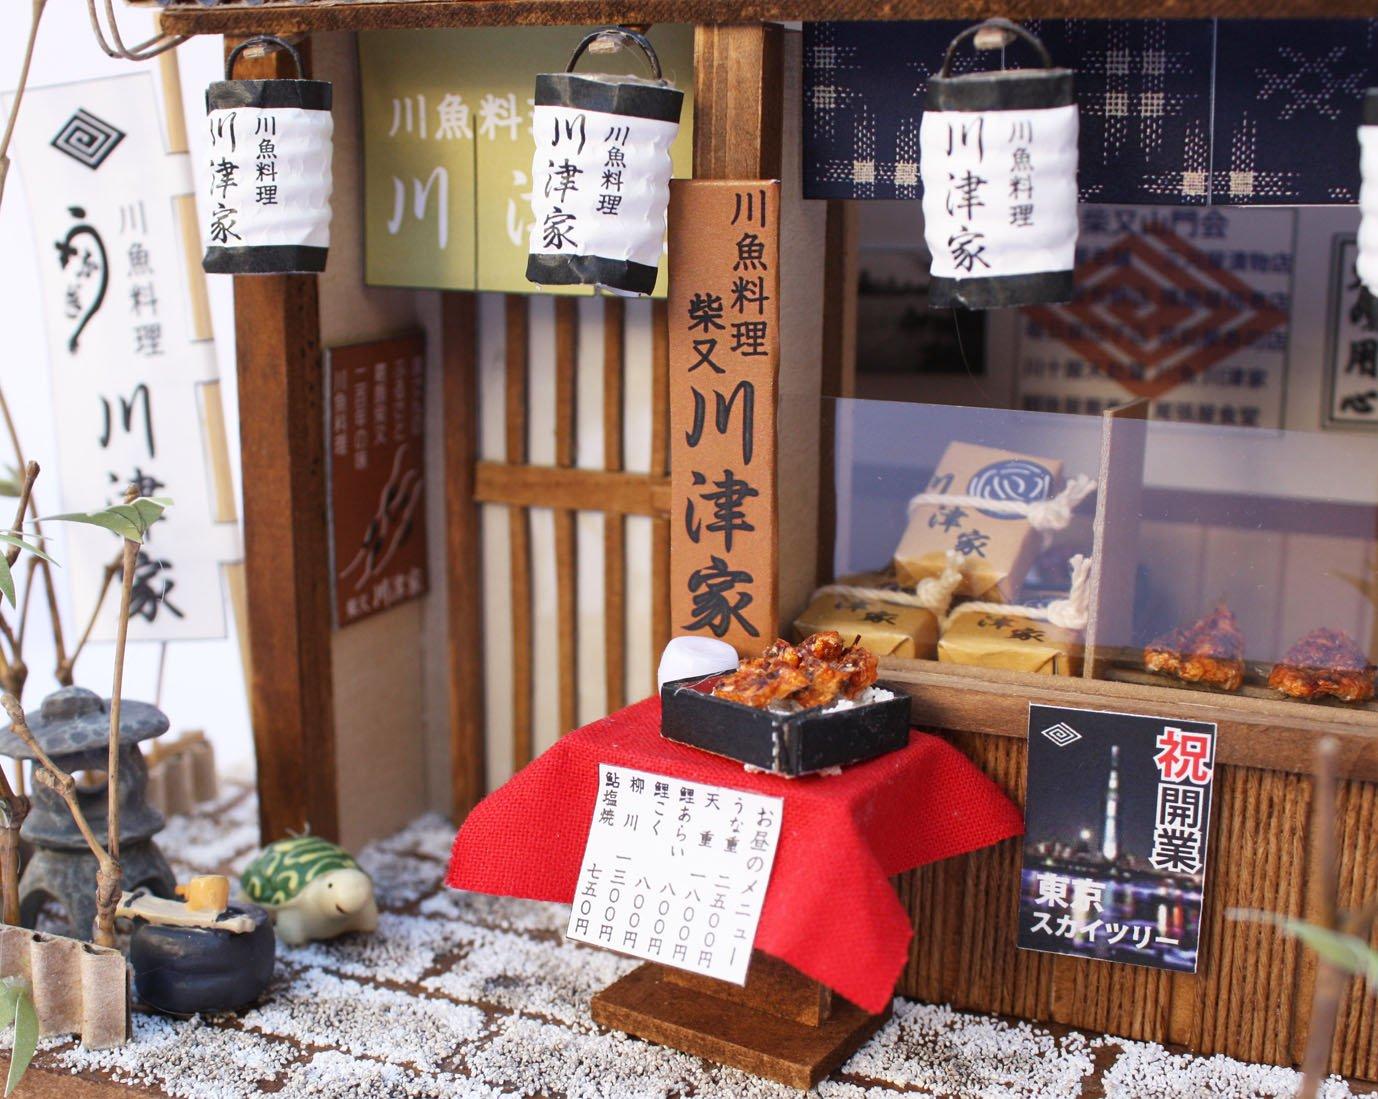 japan import Eel shop 8833 well-established kit Shibamata of Billy handmade dollhouse kit Shibamata